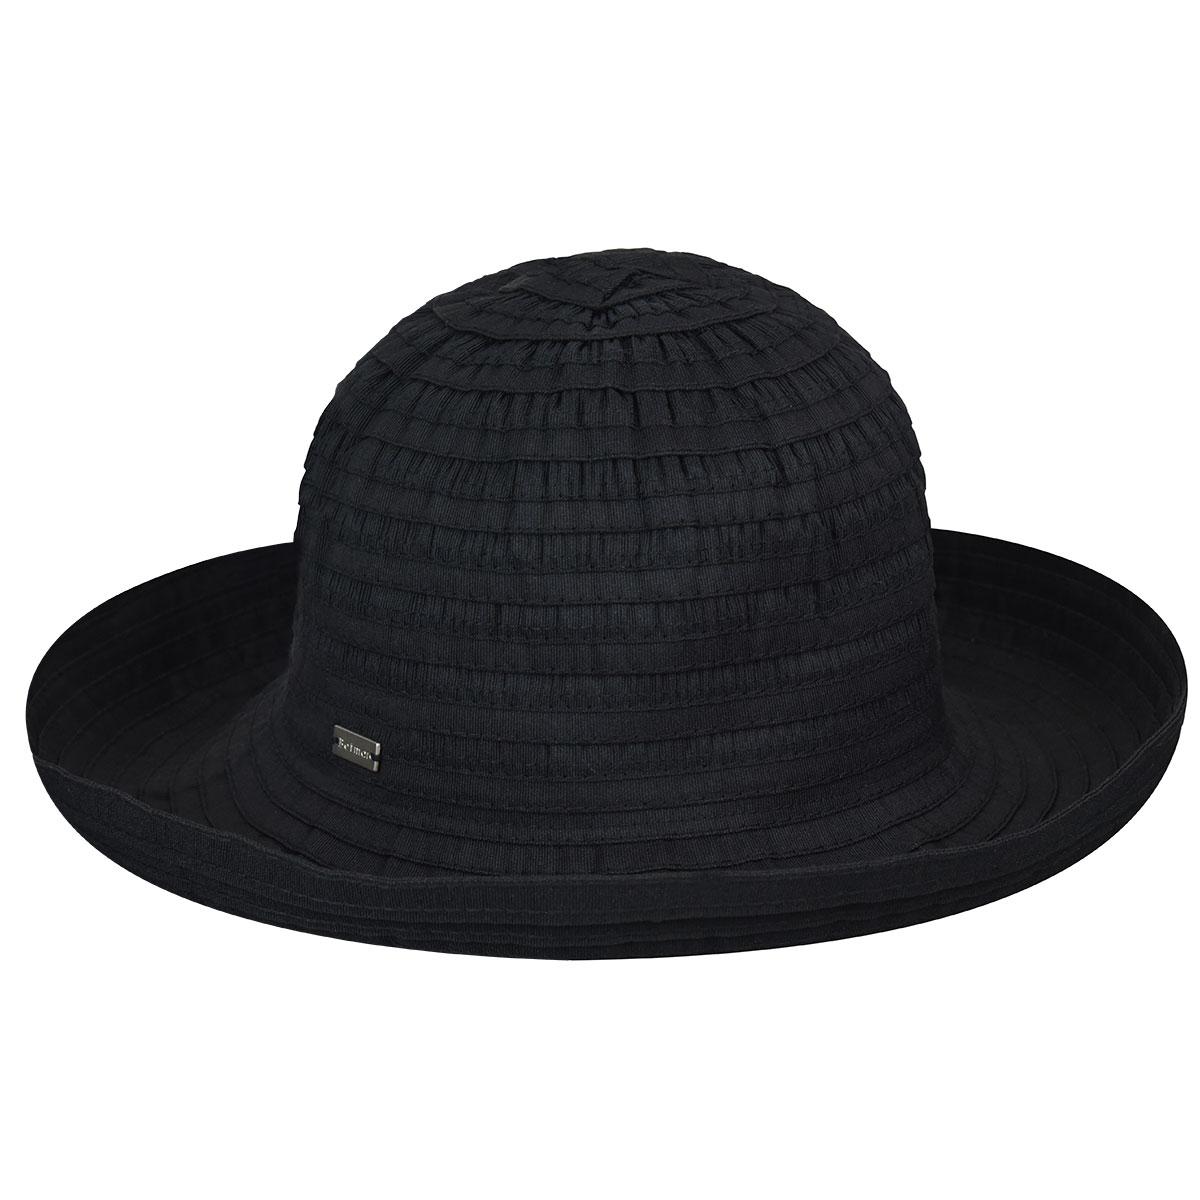 Betmar Classic Sunshade Hat in Black